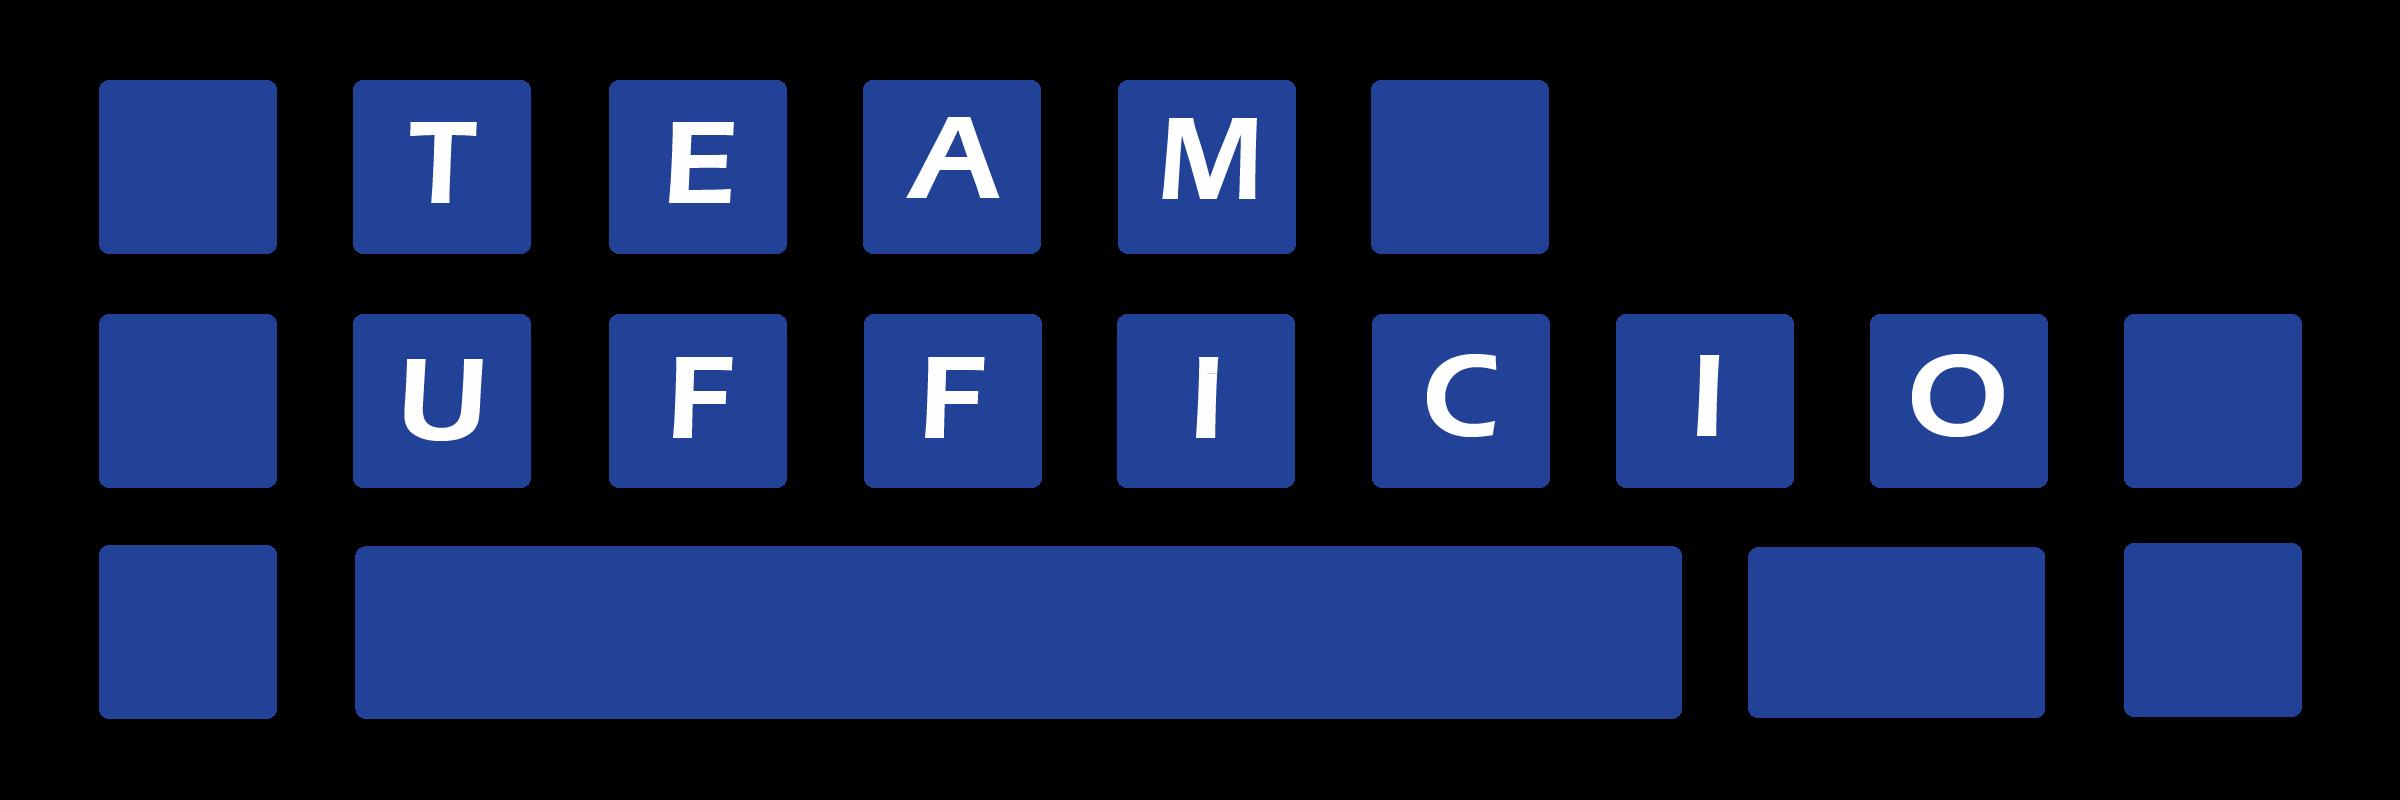 Team Ufficio